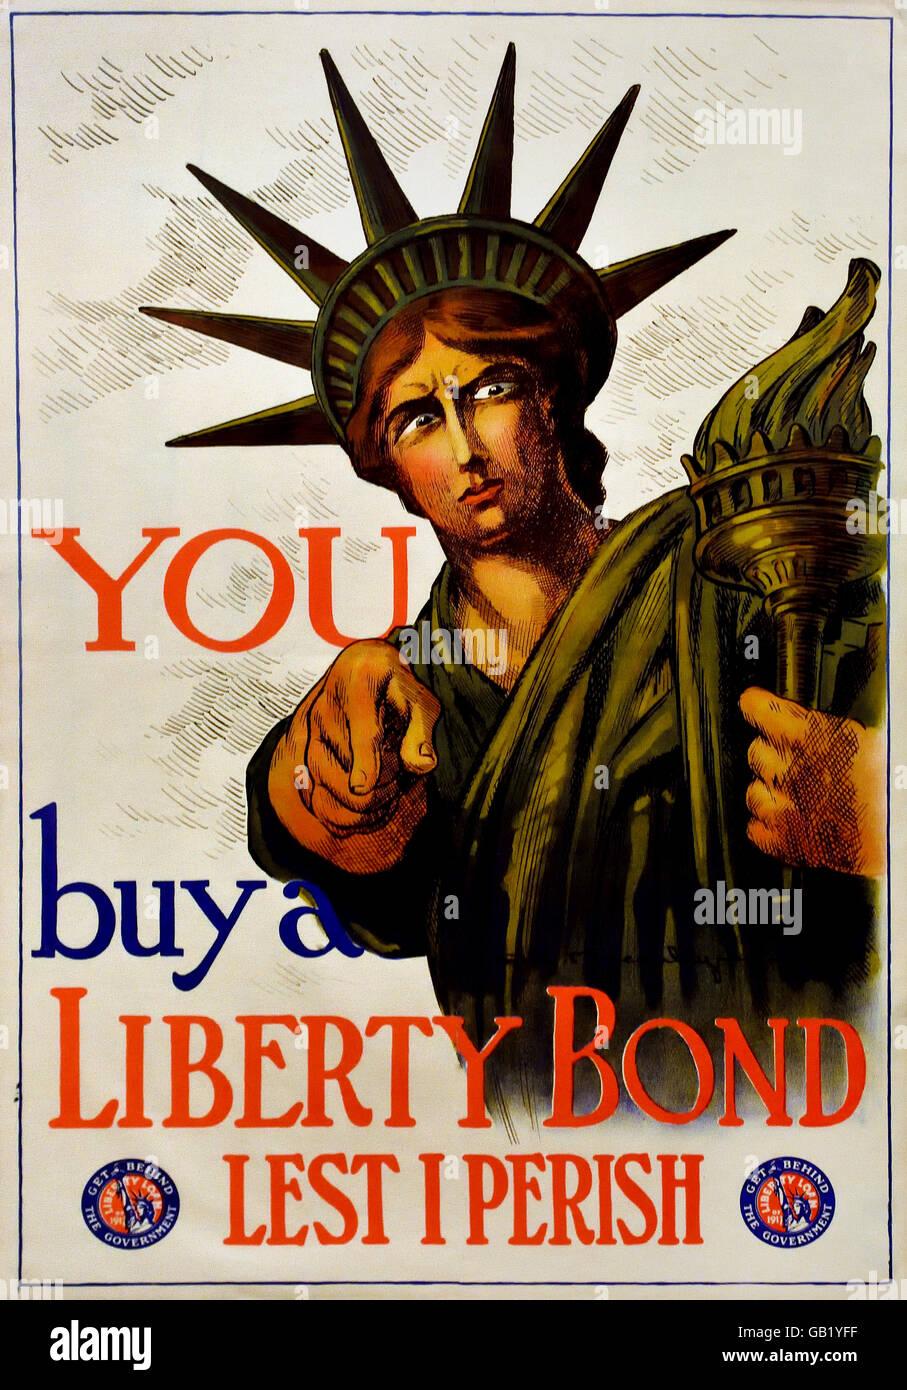 You buy a Liberty Bond Lest I Perish ( Statue of Liberty ) US Army World War one 1914 -1918 United states of America - Stock Image